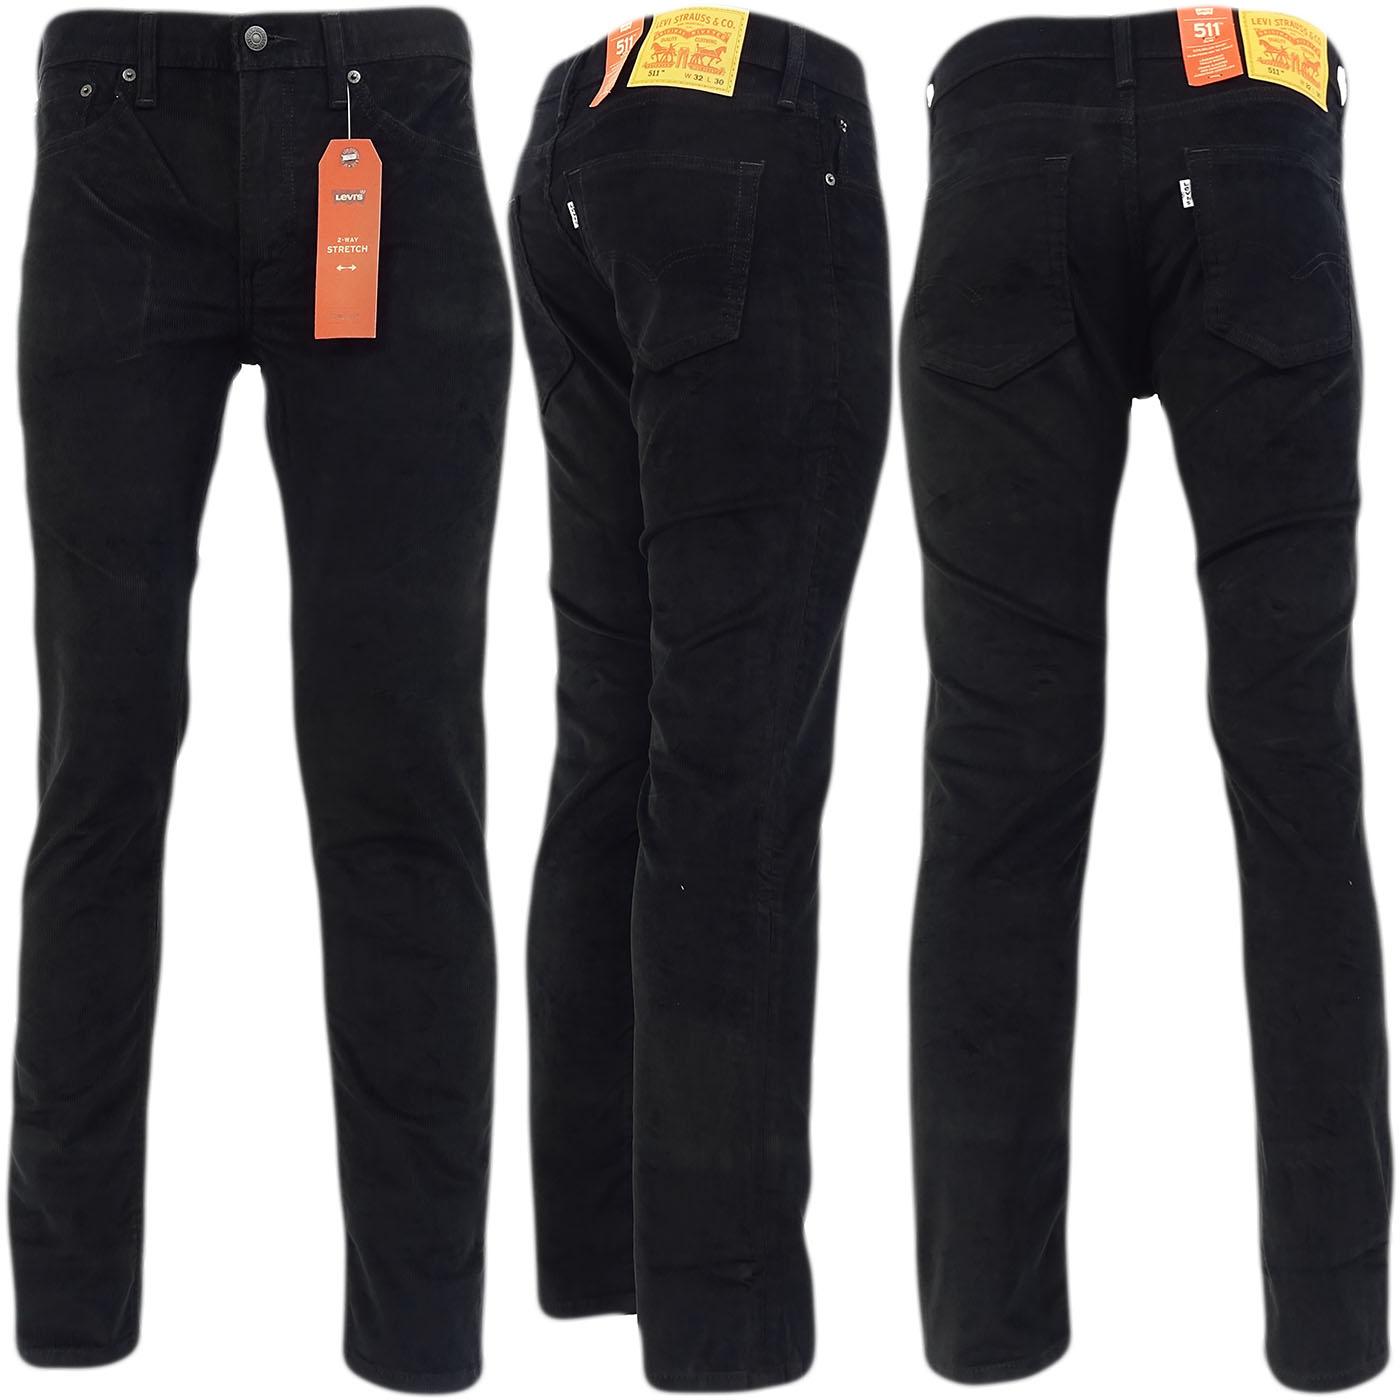 Levi-Strauss-cordon-suave-pantalones-Slim-Fit-pana-negro-20-32